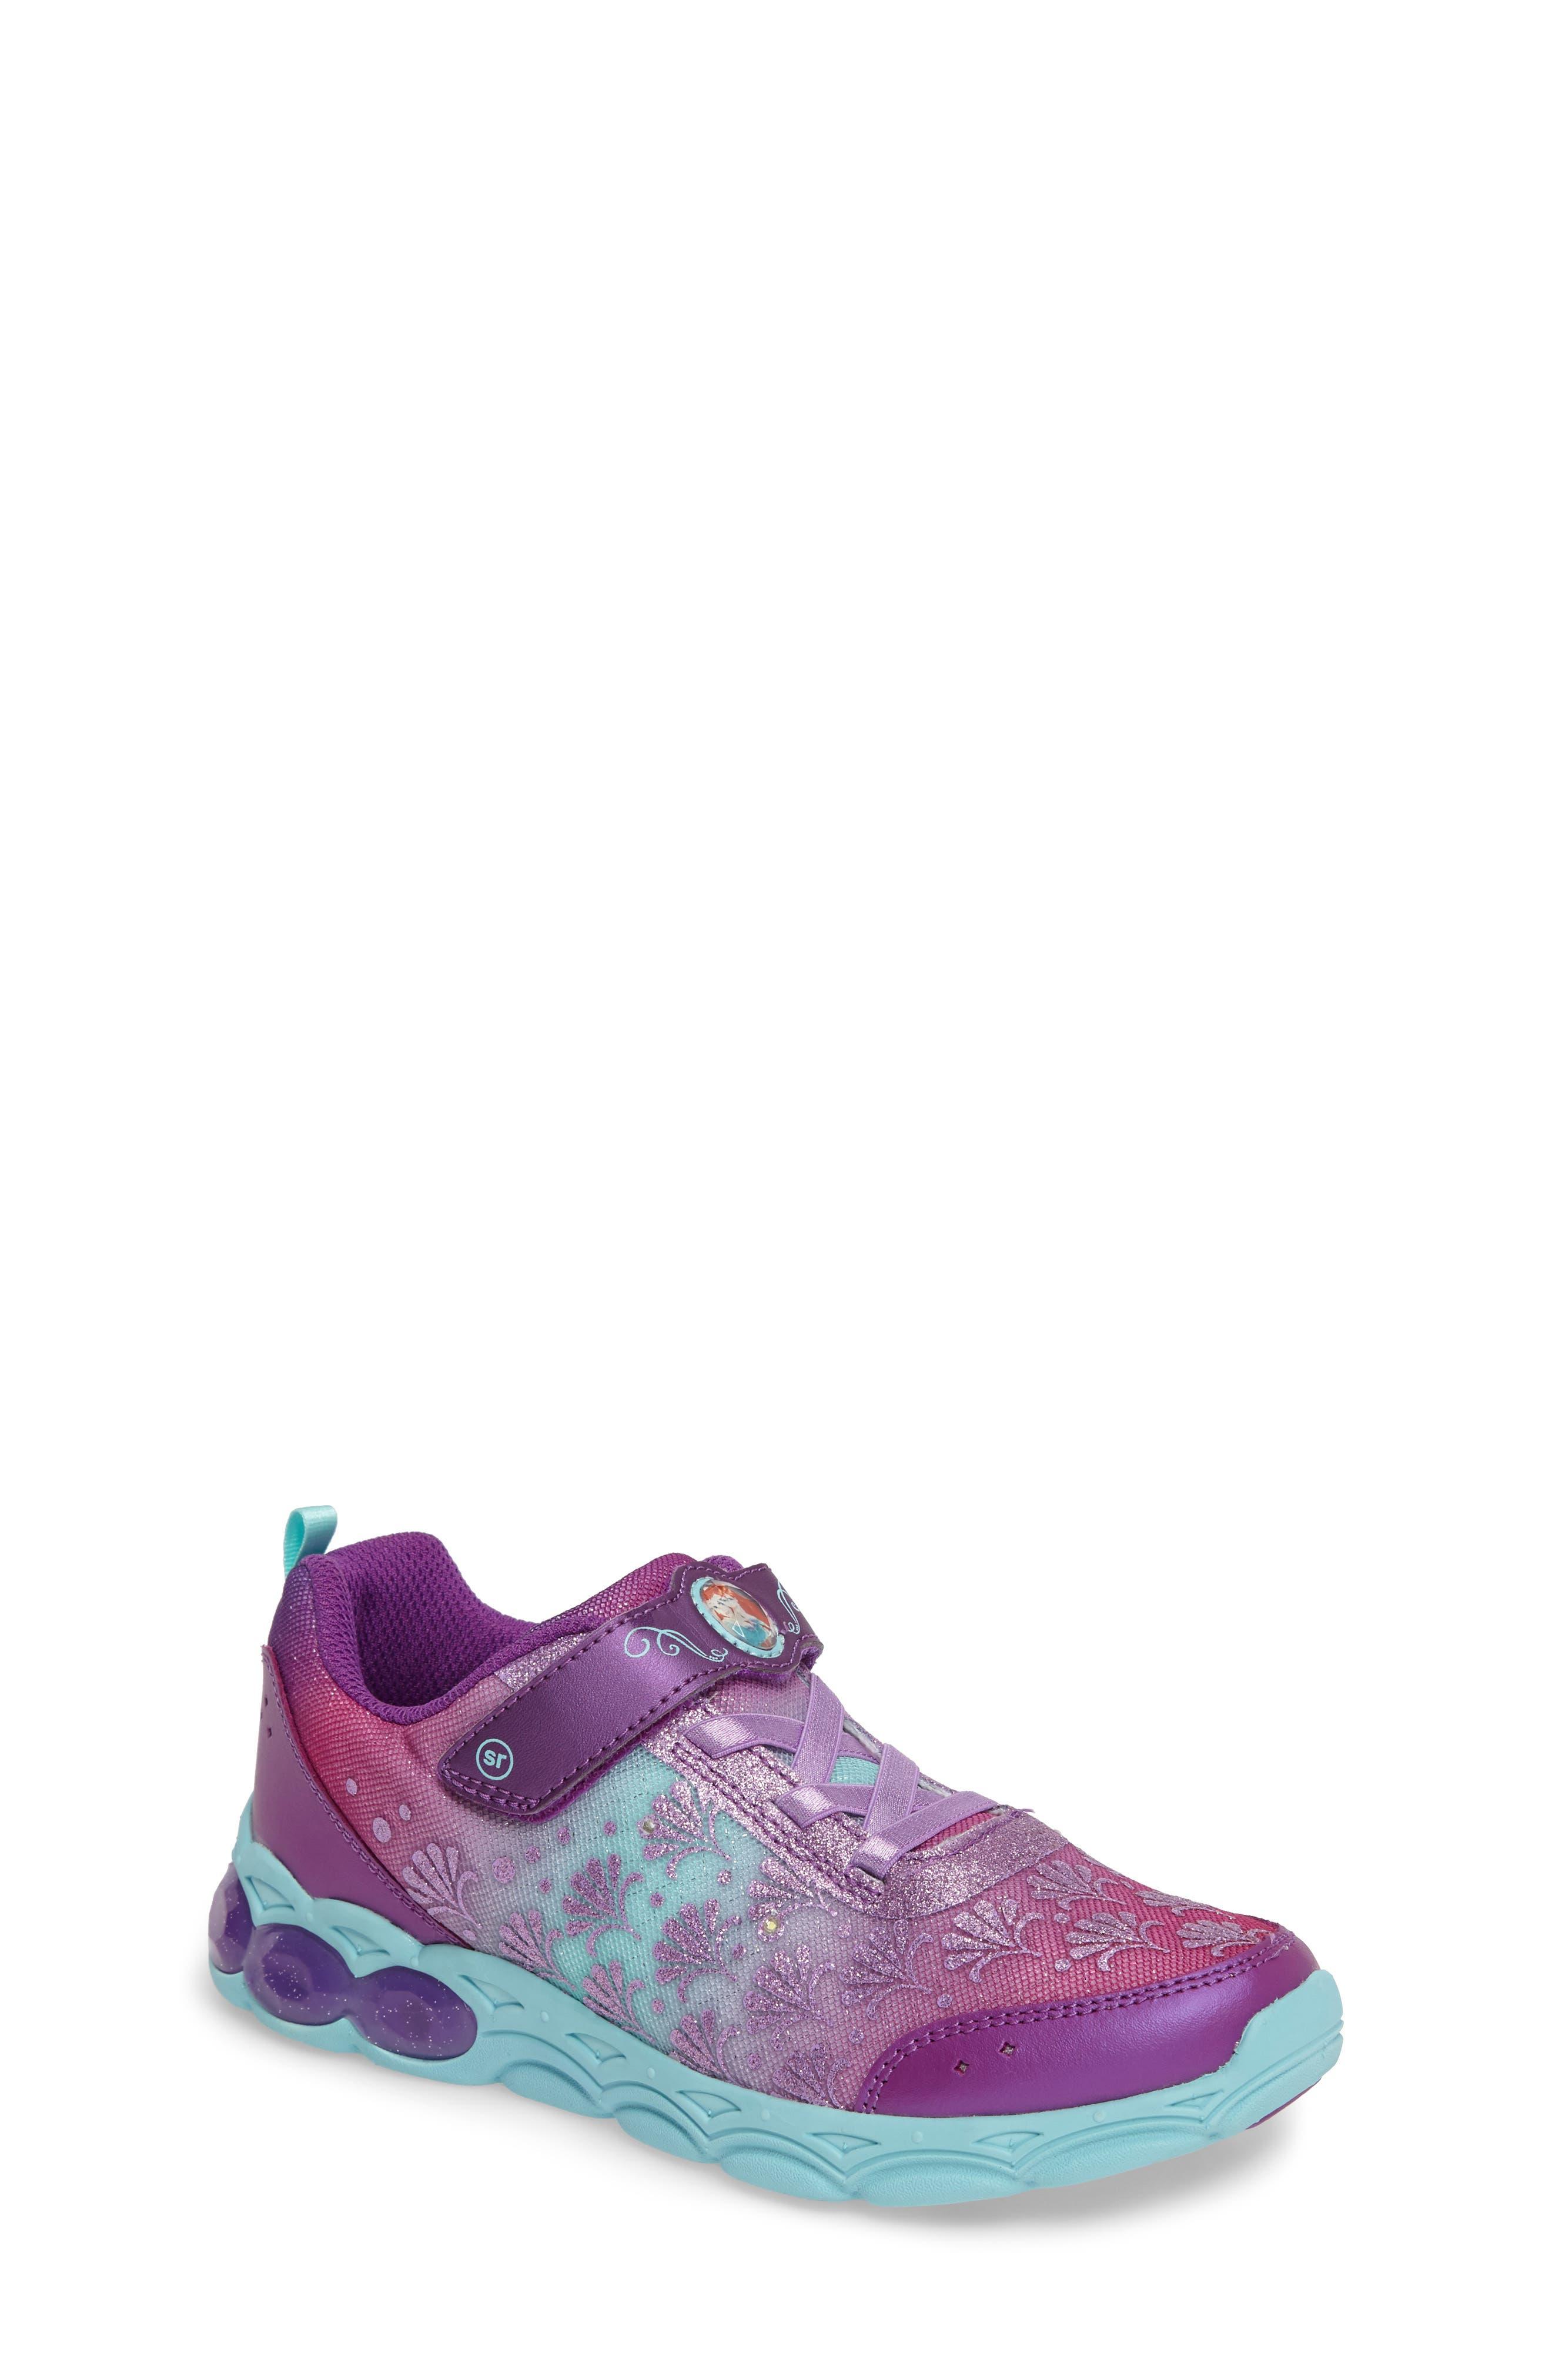 Disney<sup>®</sup> Ariel Ocean Adventurer Light-Up Sneaker,                         Main,                         color, 650